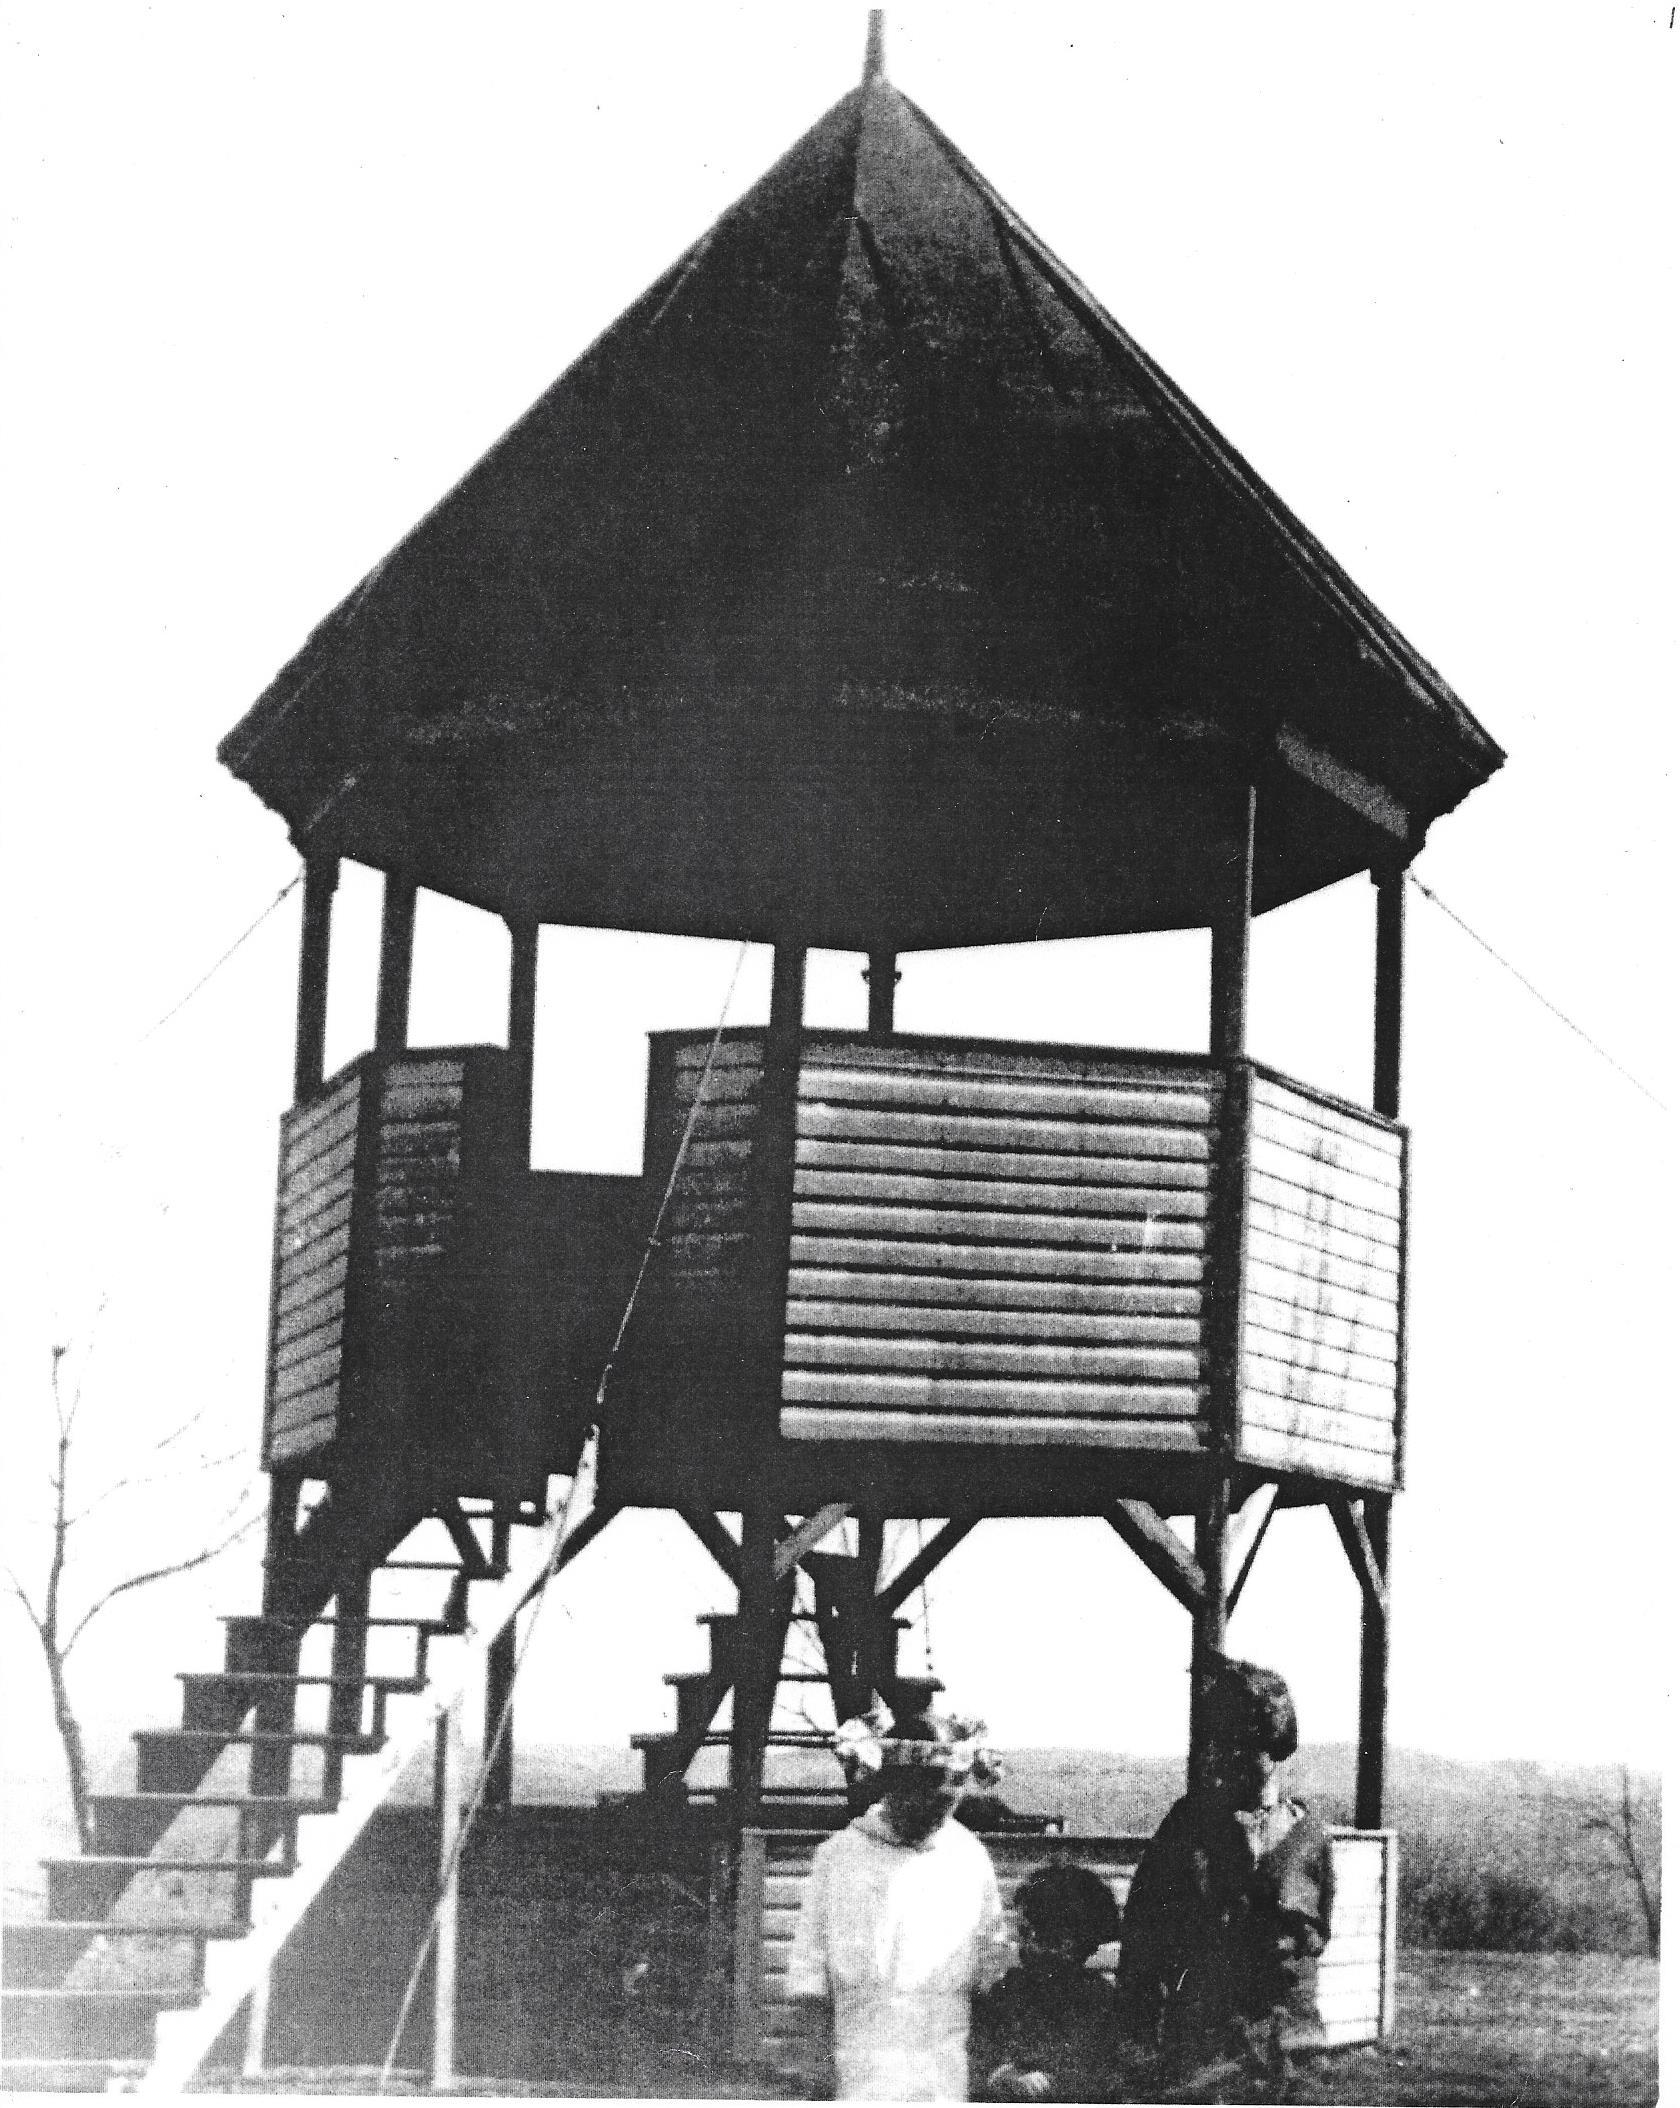 Judge's Tower